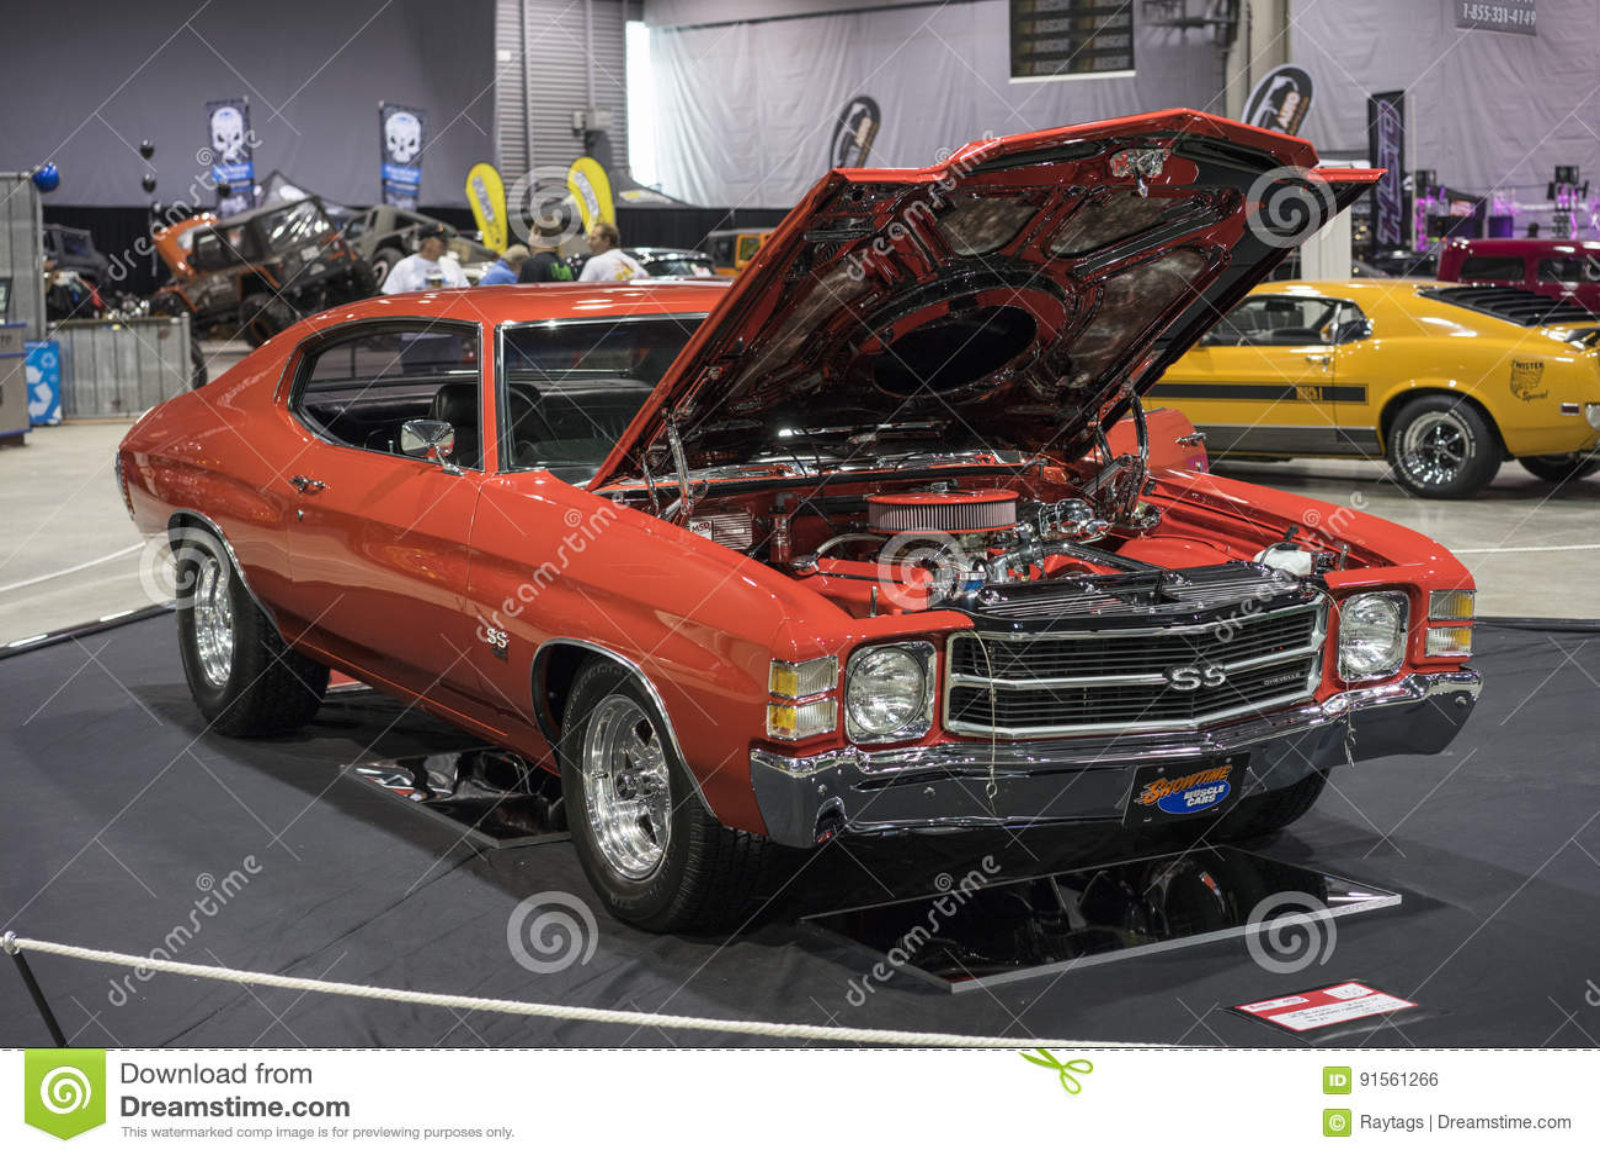 2016 Chevelle Ss >> Chevrolet Chevelle Hardtop Editorial Photo Image Of Retro 91561266